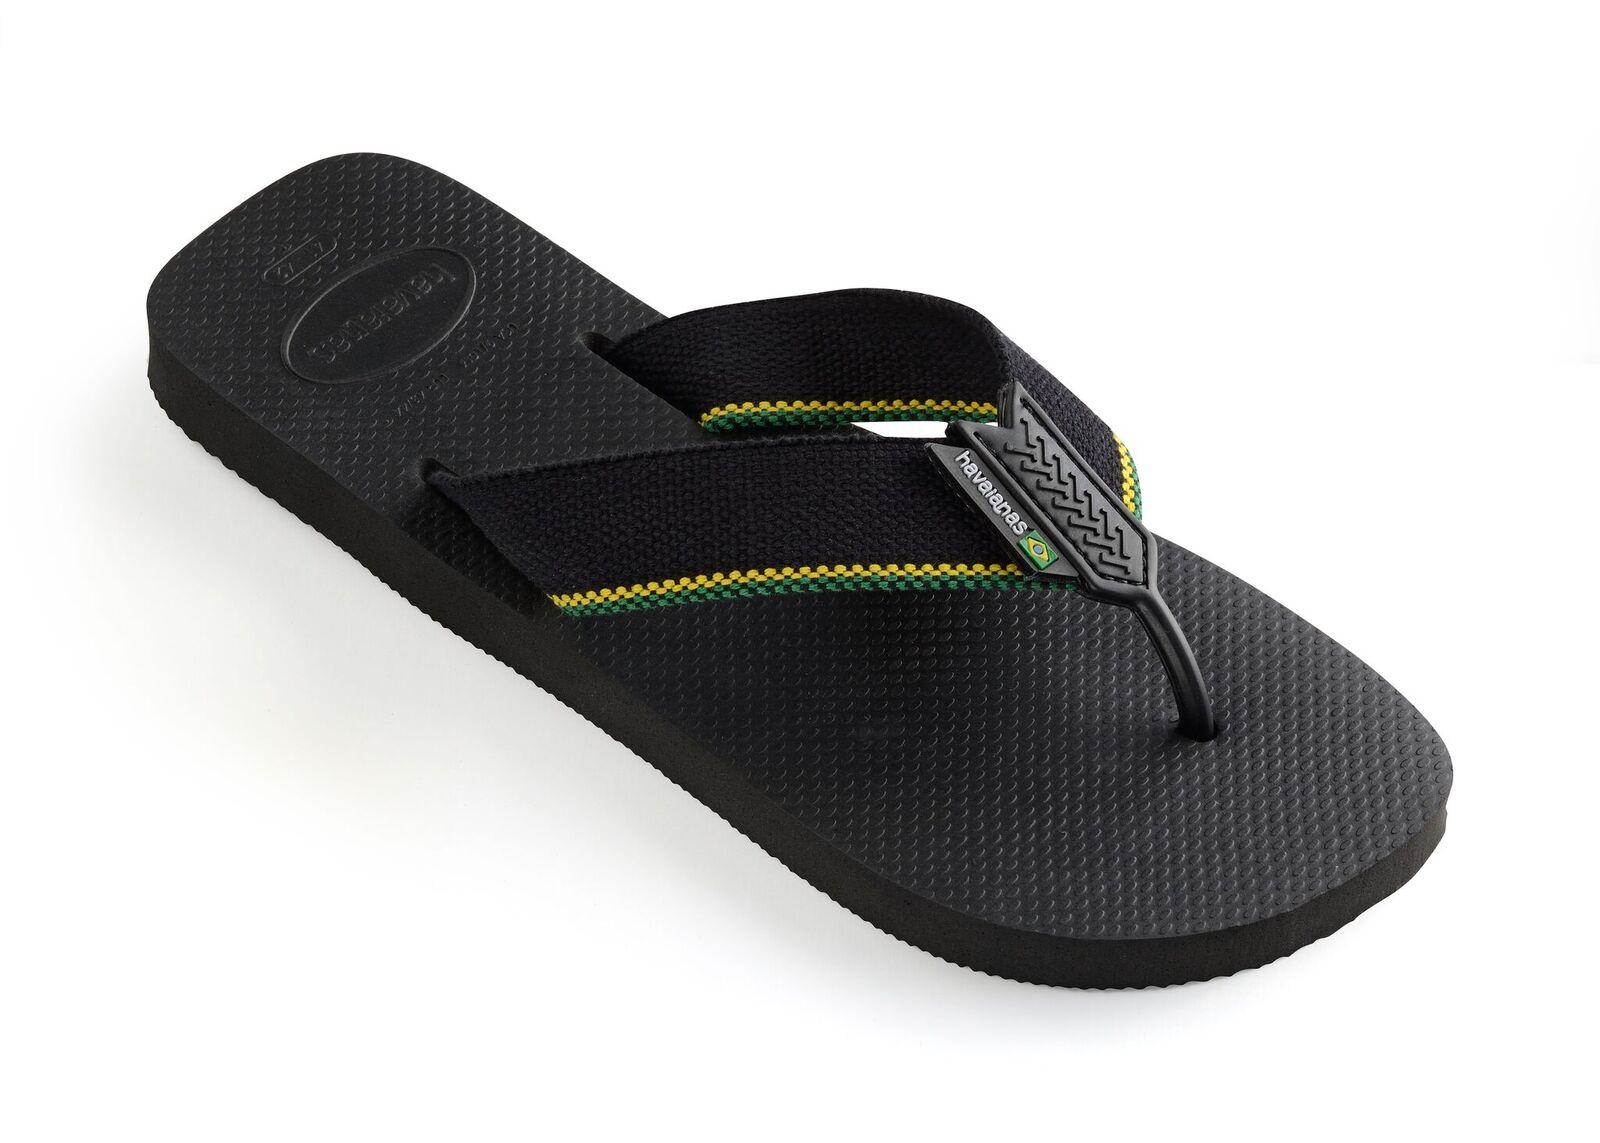 7f5ccb8341e Urban Brazil - Havaianas - Mens Footwear-Jandals   Mariposa Clothing ...